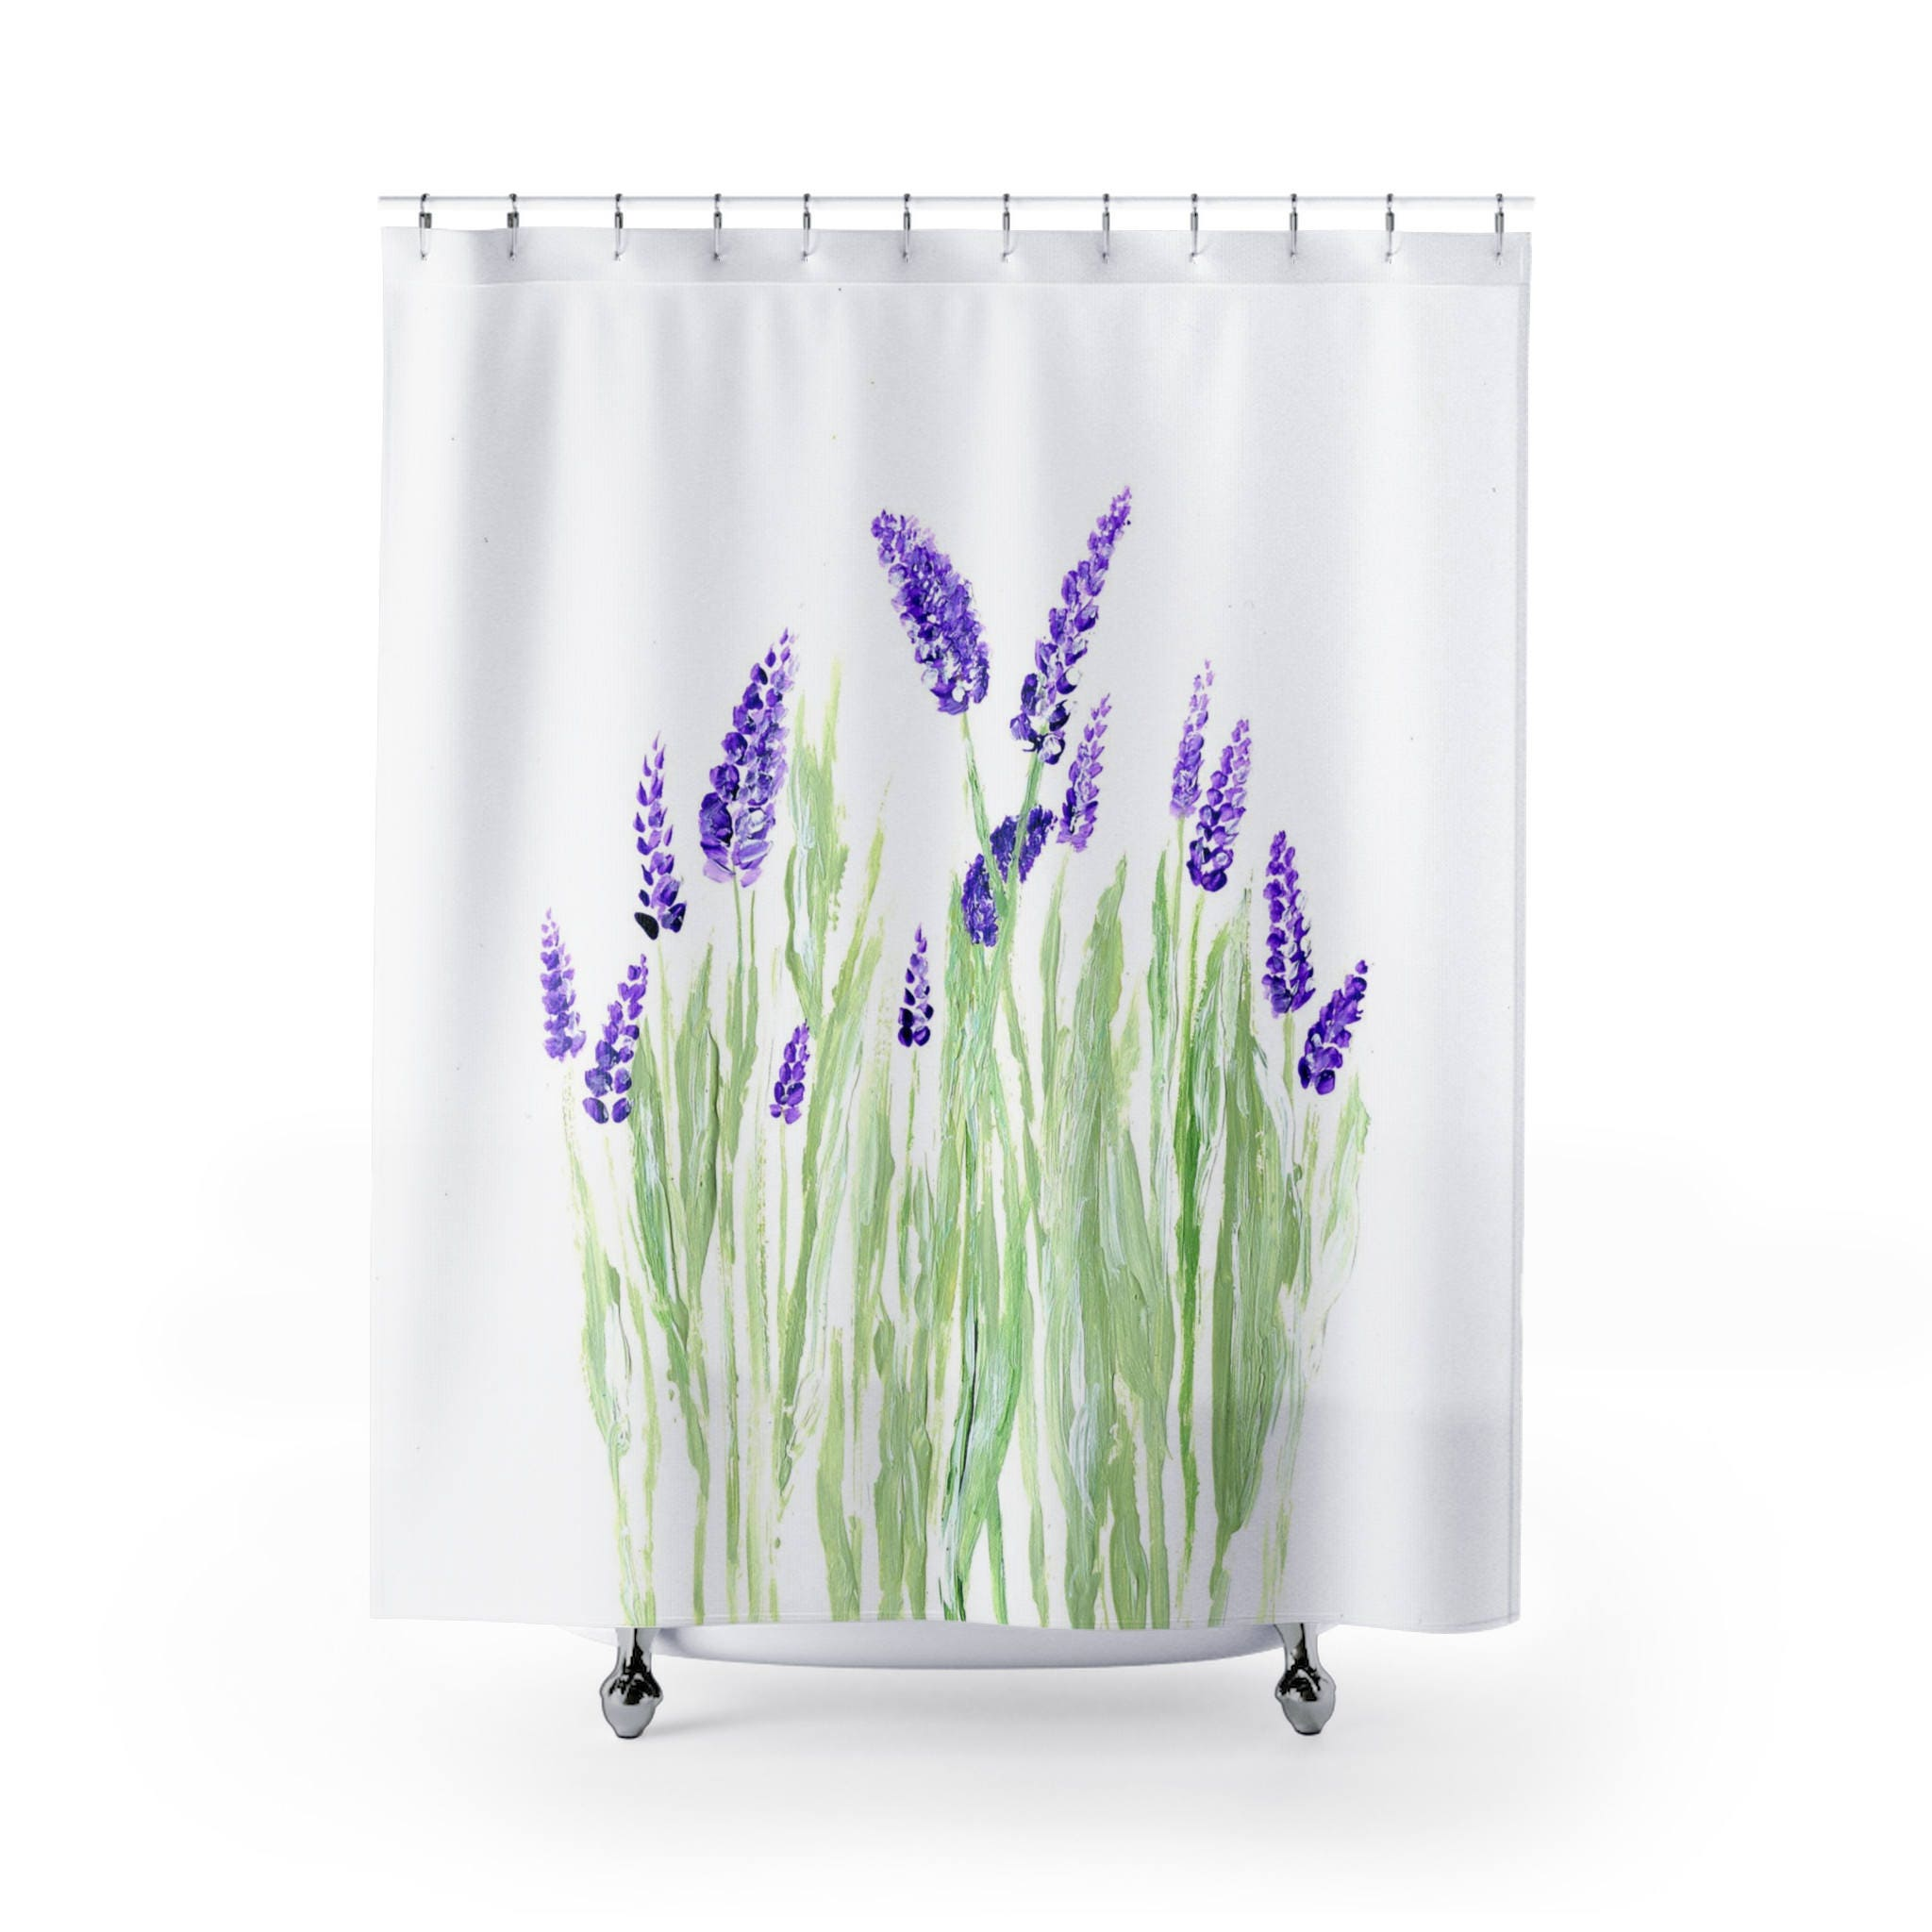 Lavender Shower Curtain lavender curtain floral shower | Etsy